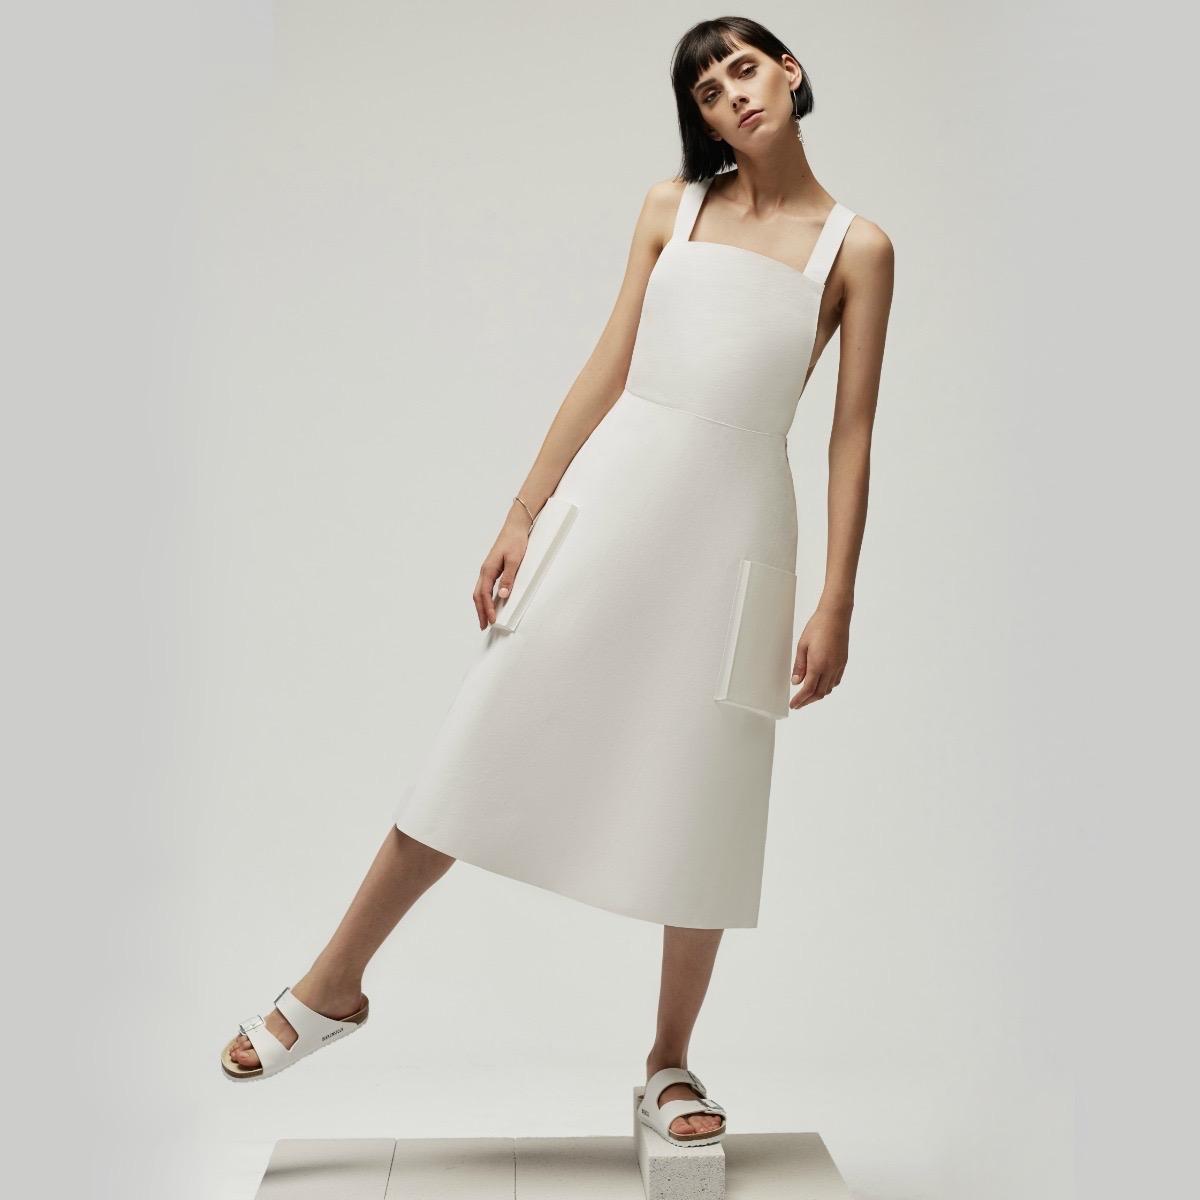 Philomena Zanetti Berlin 2017 White Dress